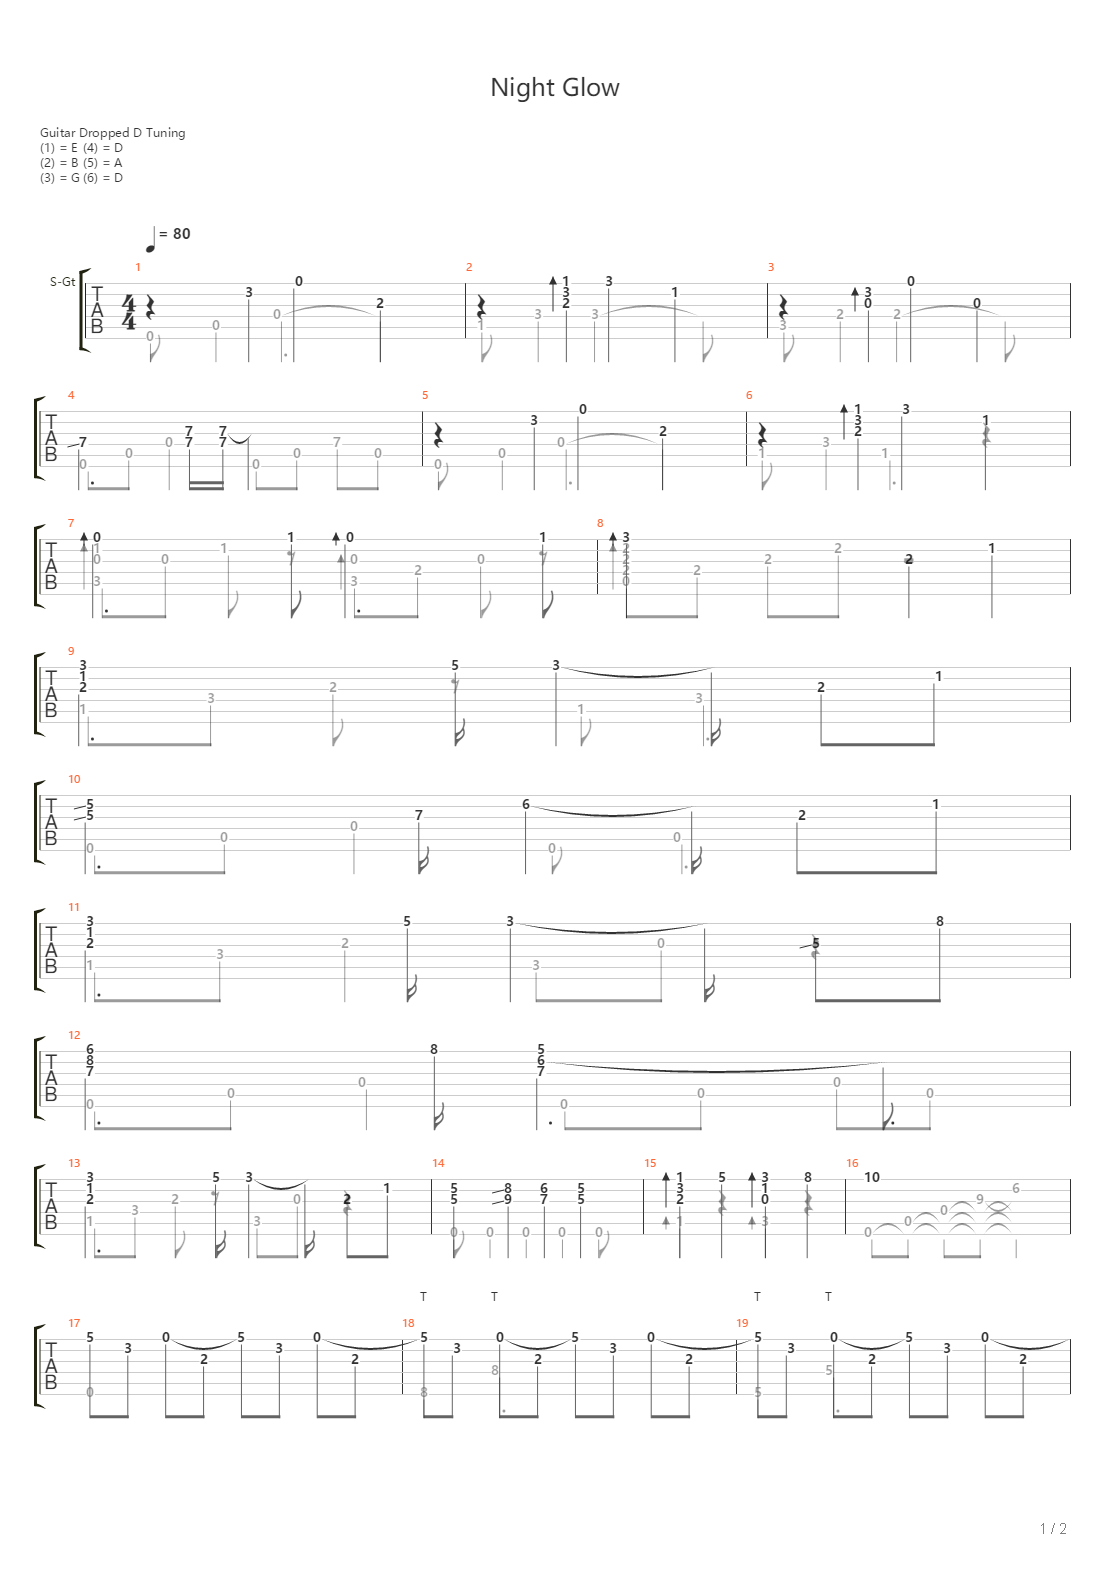 Nightglow(崩坏3「最后一课」印象曲)吉他谱